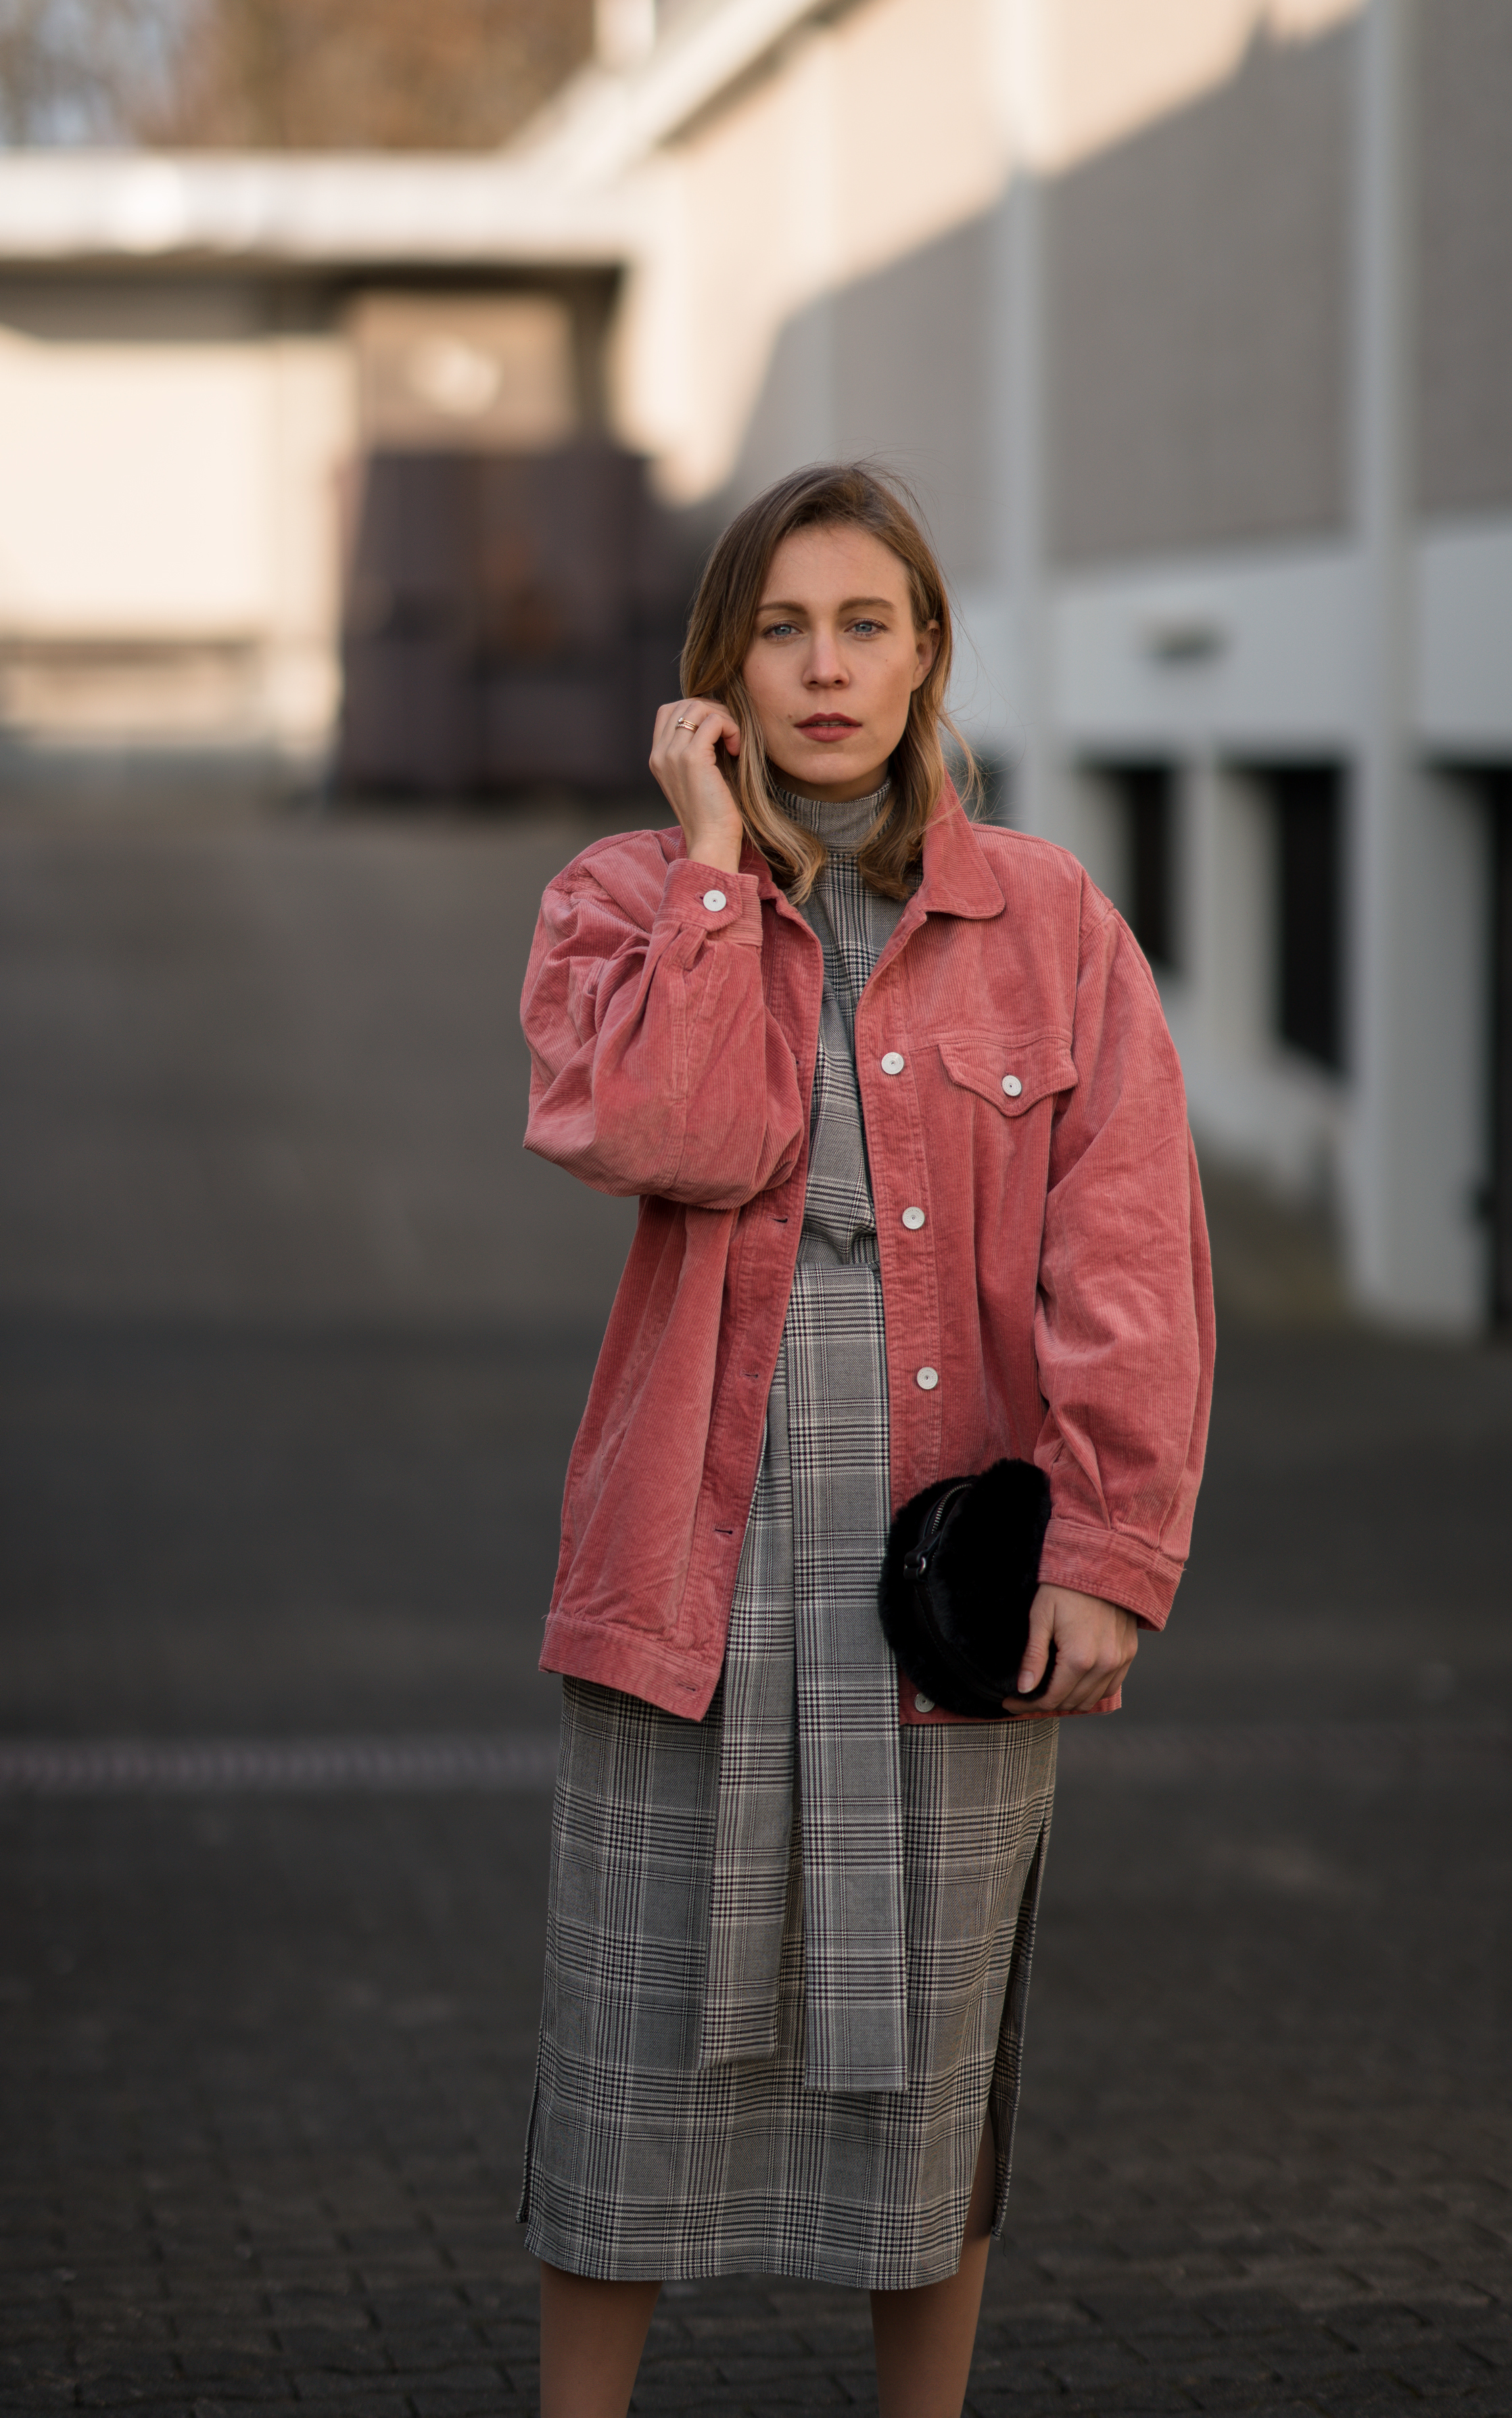 Pink Cord Jacket Glencheck Dress White Sneakers oversize Mango Cordjacke kariertes Kleid Zara Cord Trend Streetstyle Modeblog Sariety Fashionblogger Heidelberg_1-001